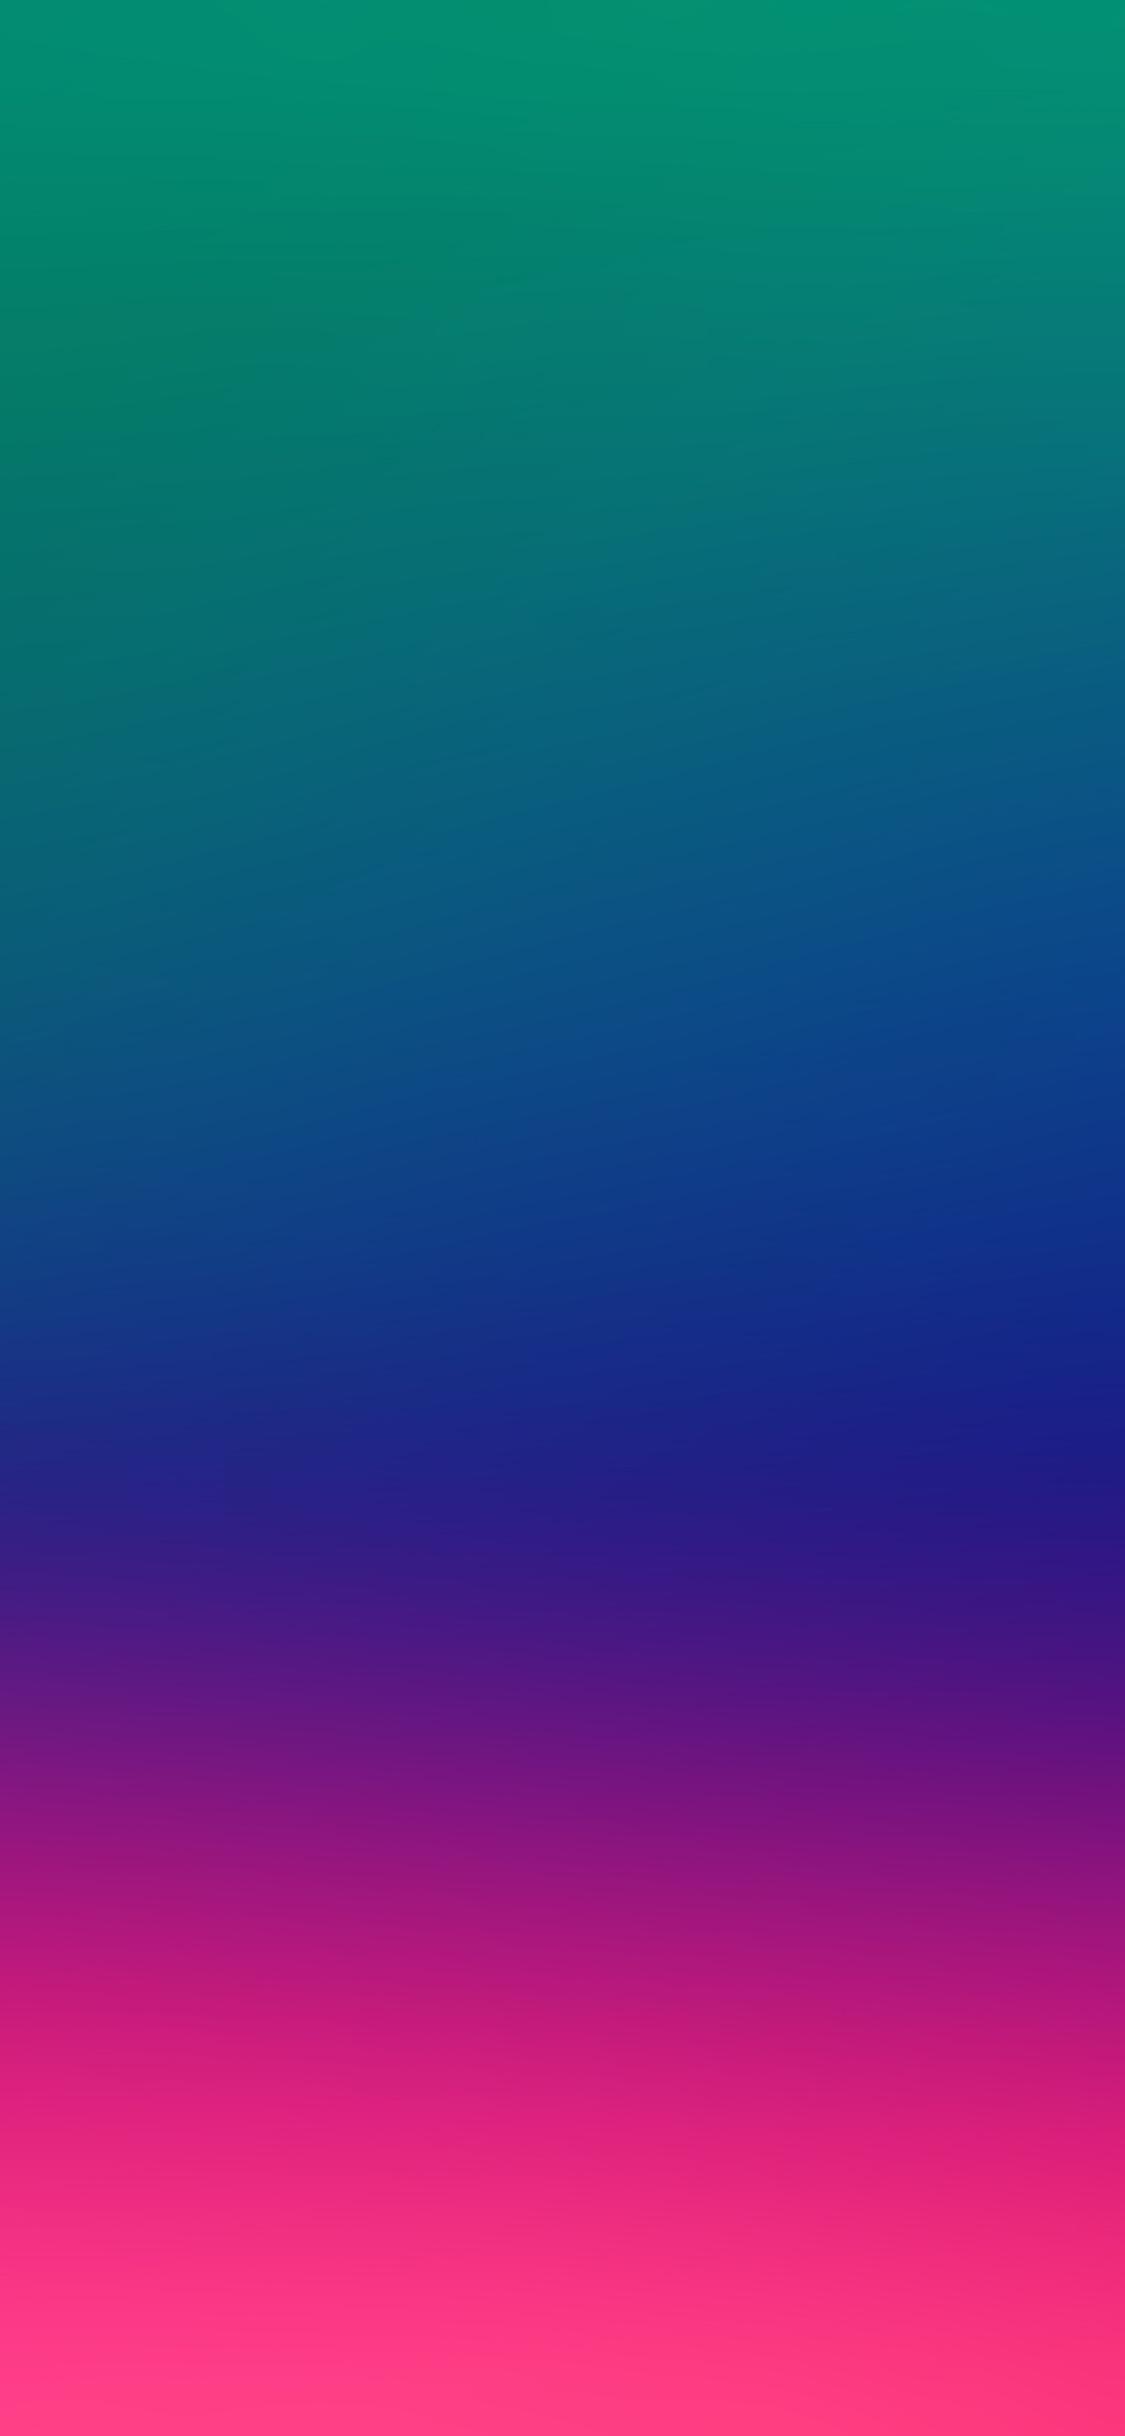 Pattern Wallpaper Hd Sg12 Blue Pink Color Gradation Blur Papers Co